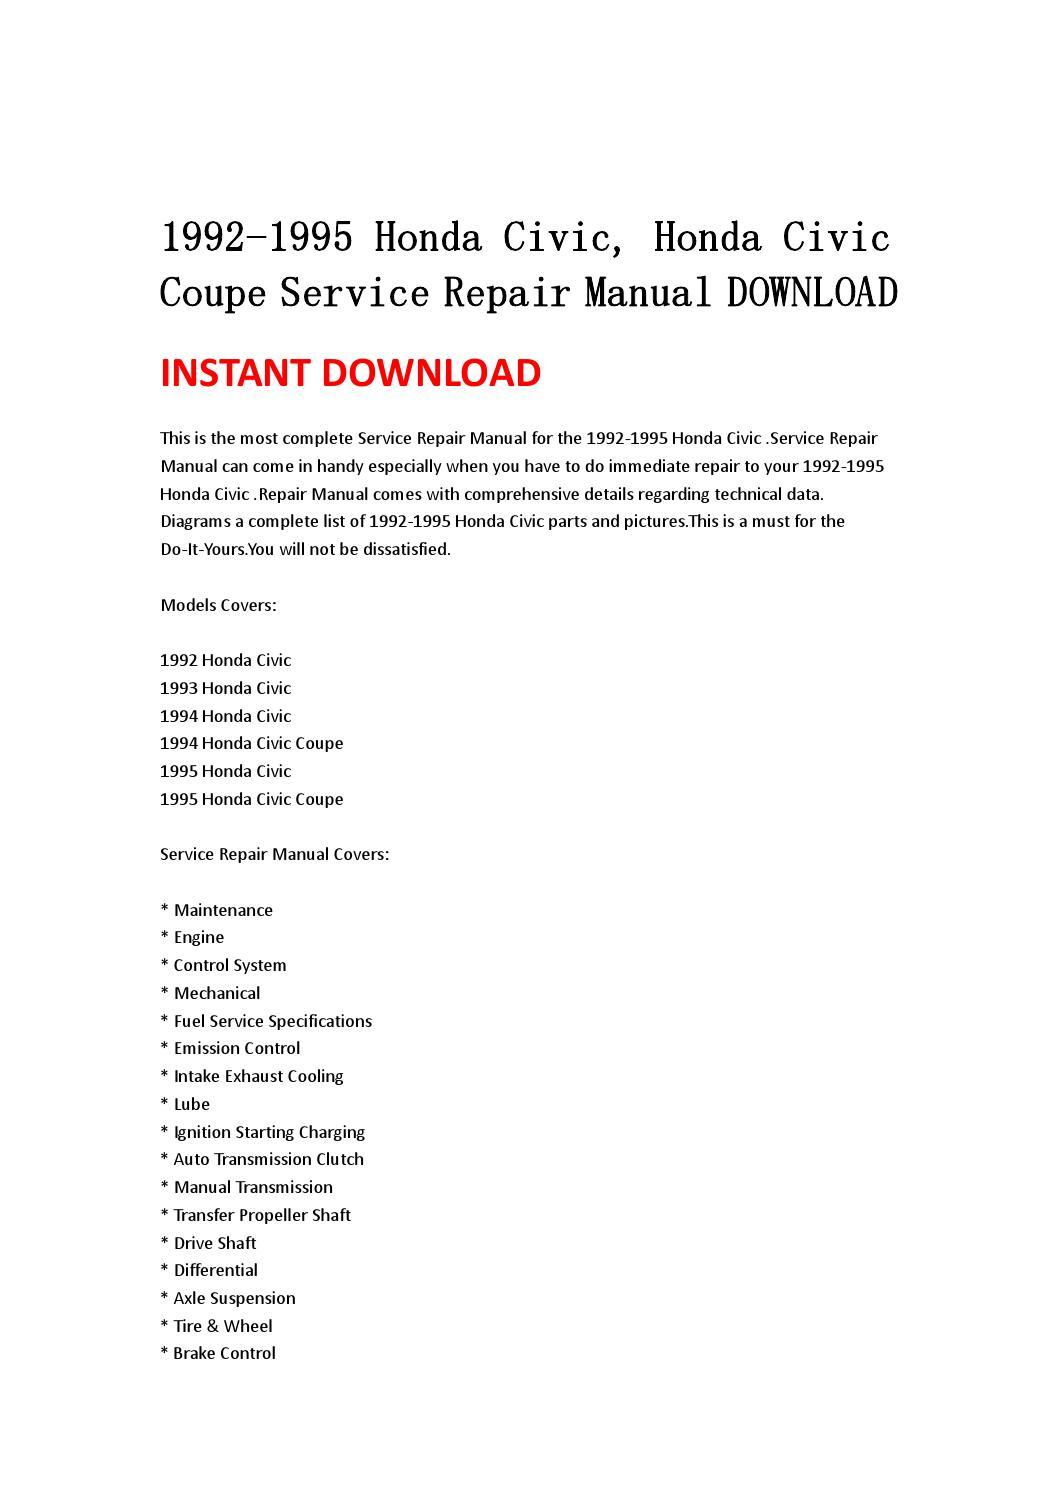 1992 honda accord lx manual download